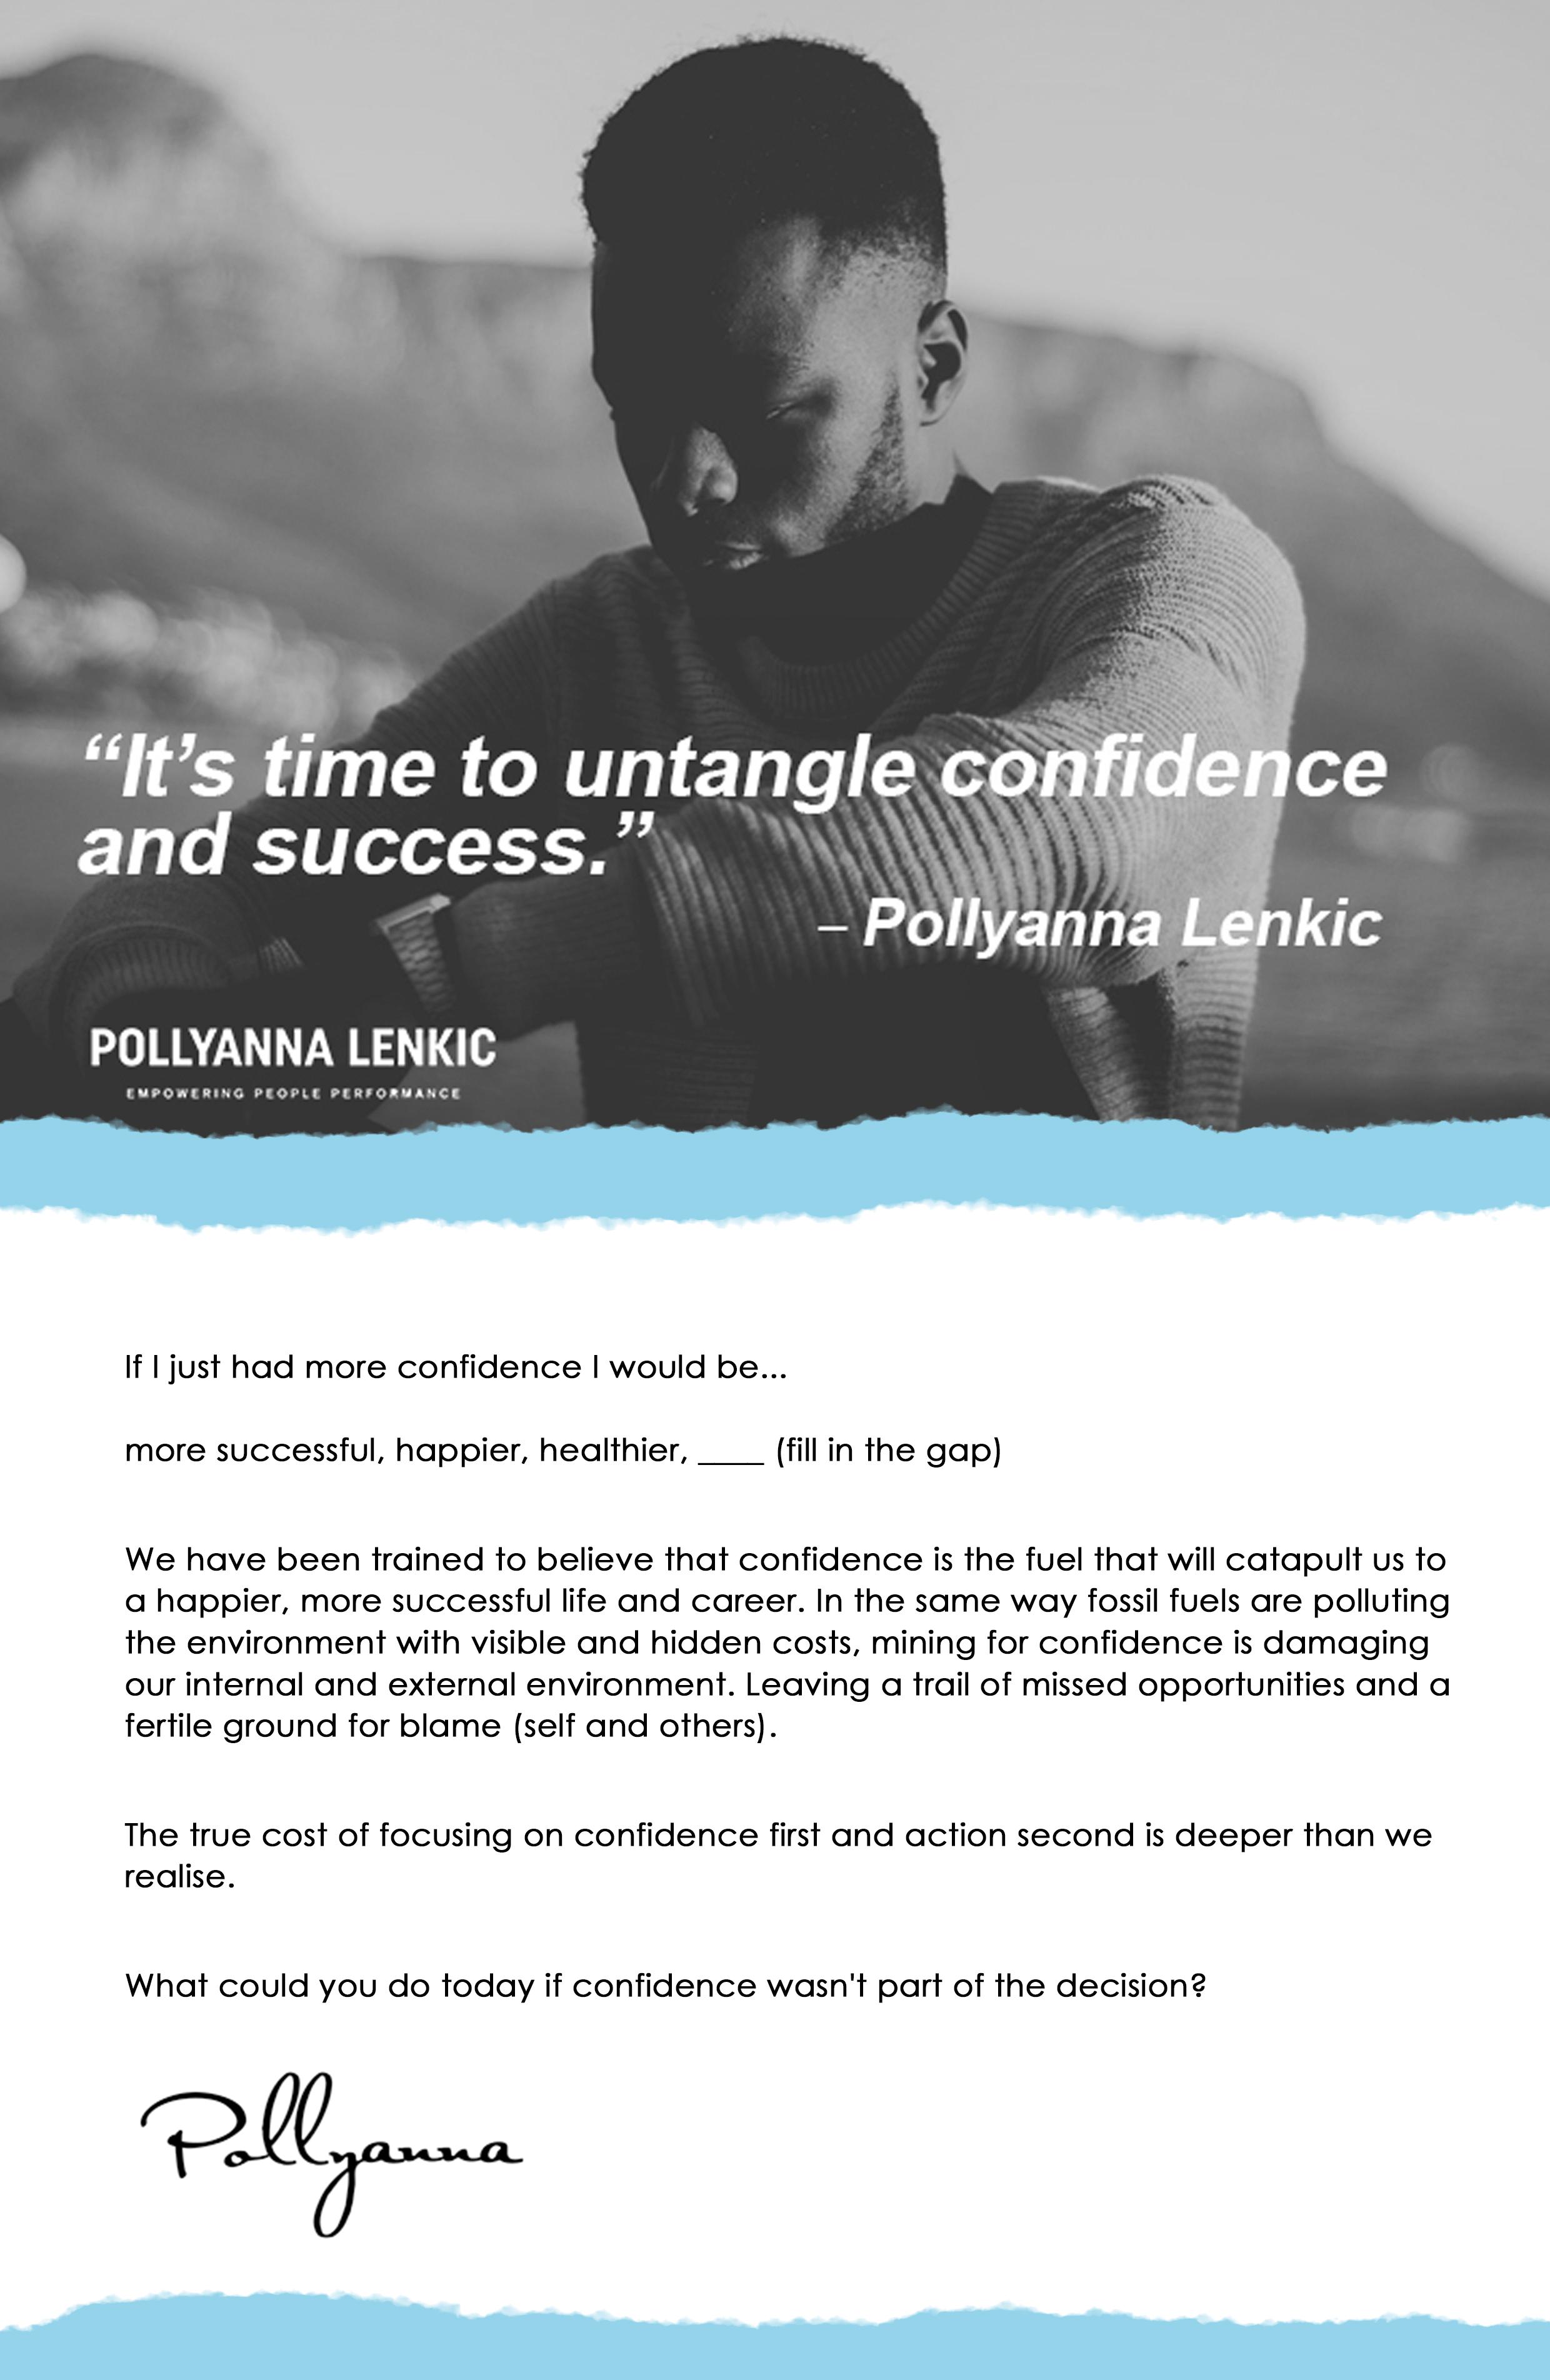 QR_Untangle Confidence.jpg